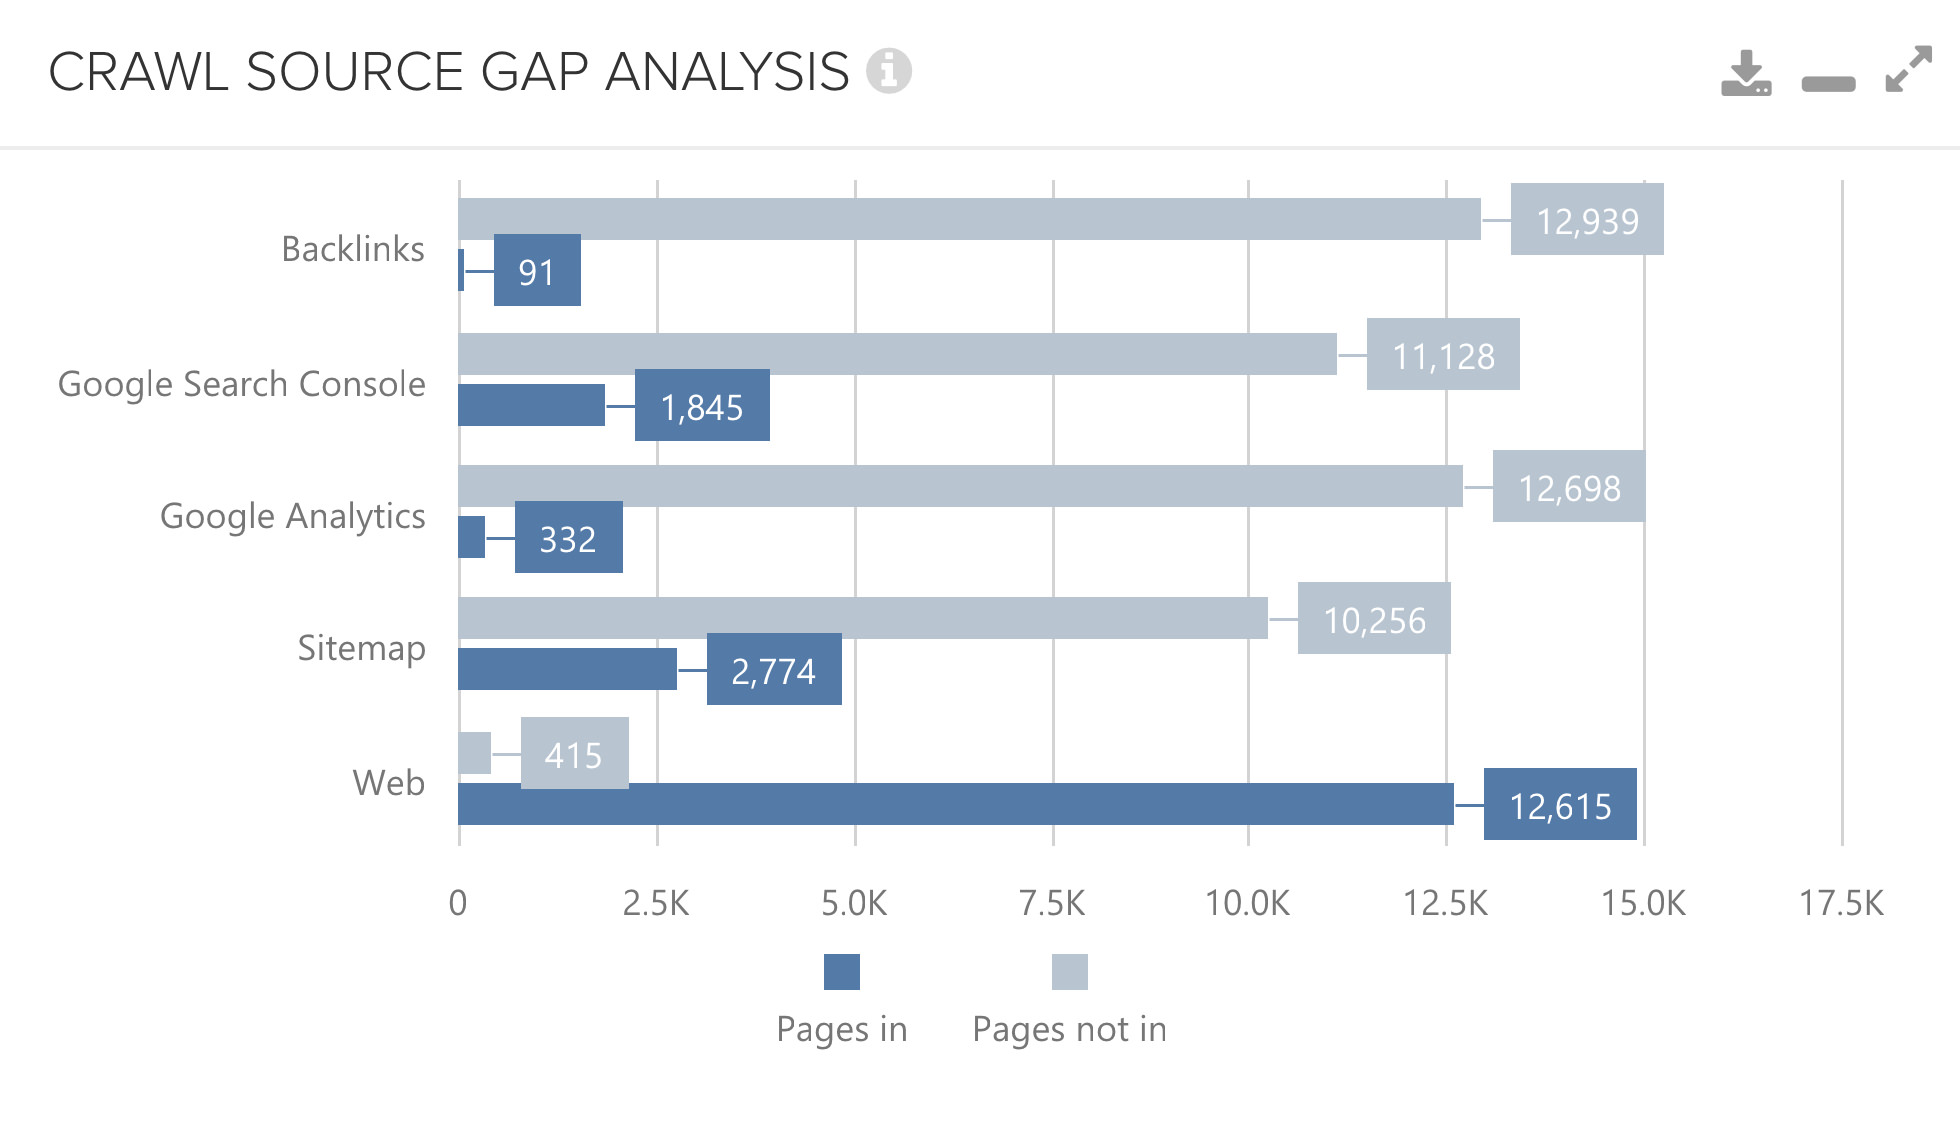 DeepCrawl Crawl Source Gap Analysis